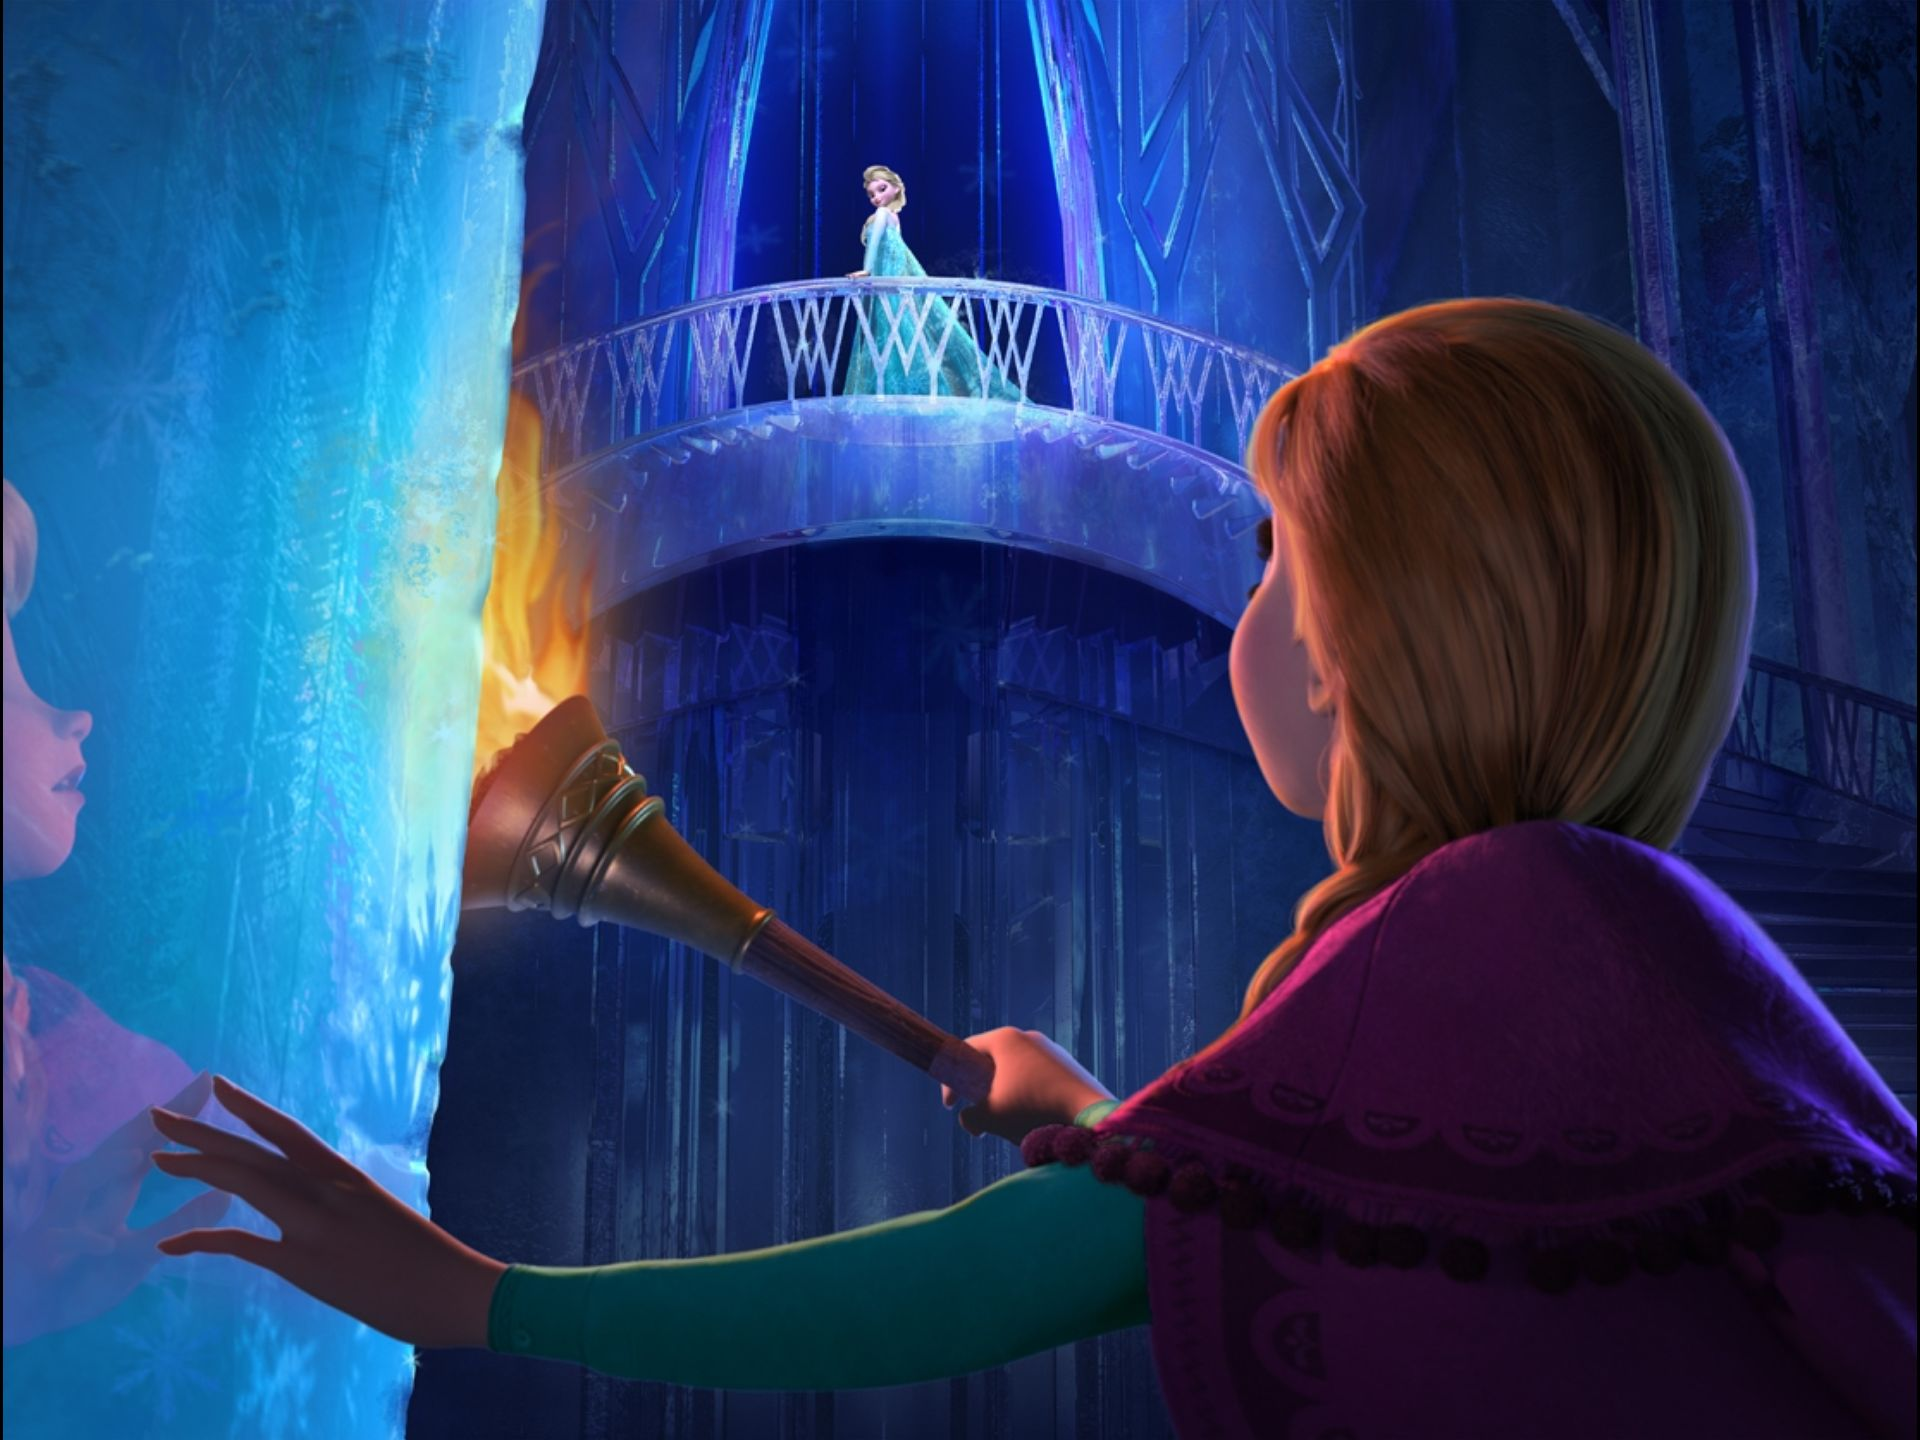 Anna in Elsa's ice castle - Still from 'Frozen'